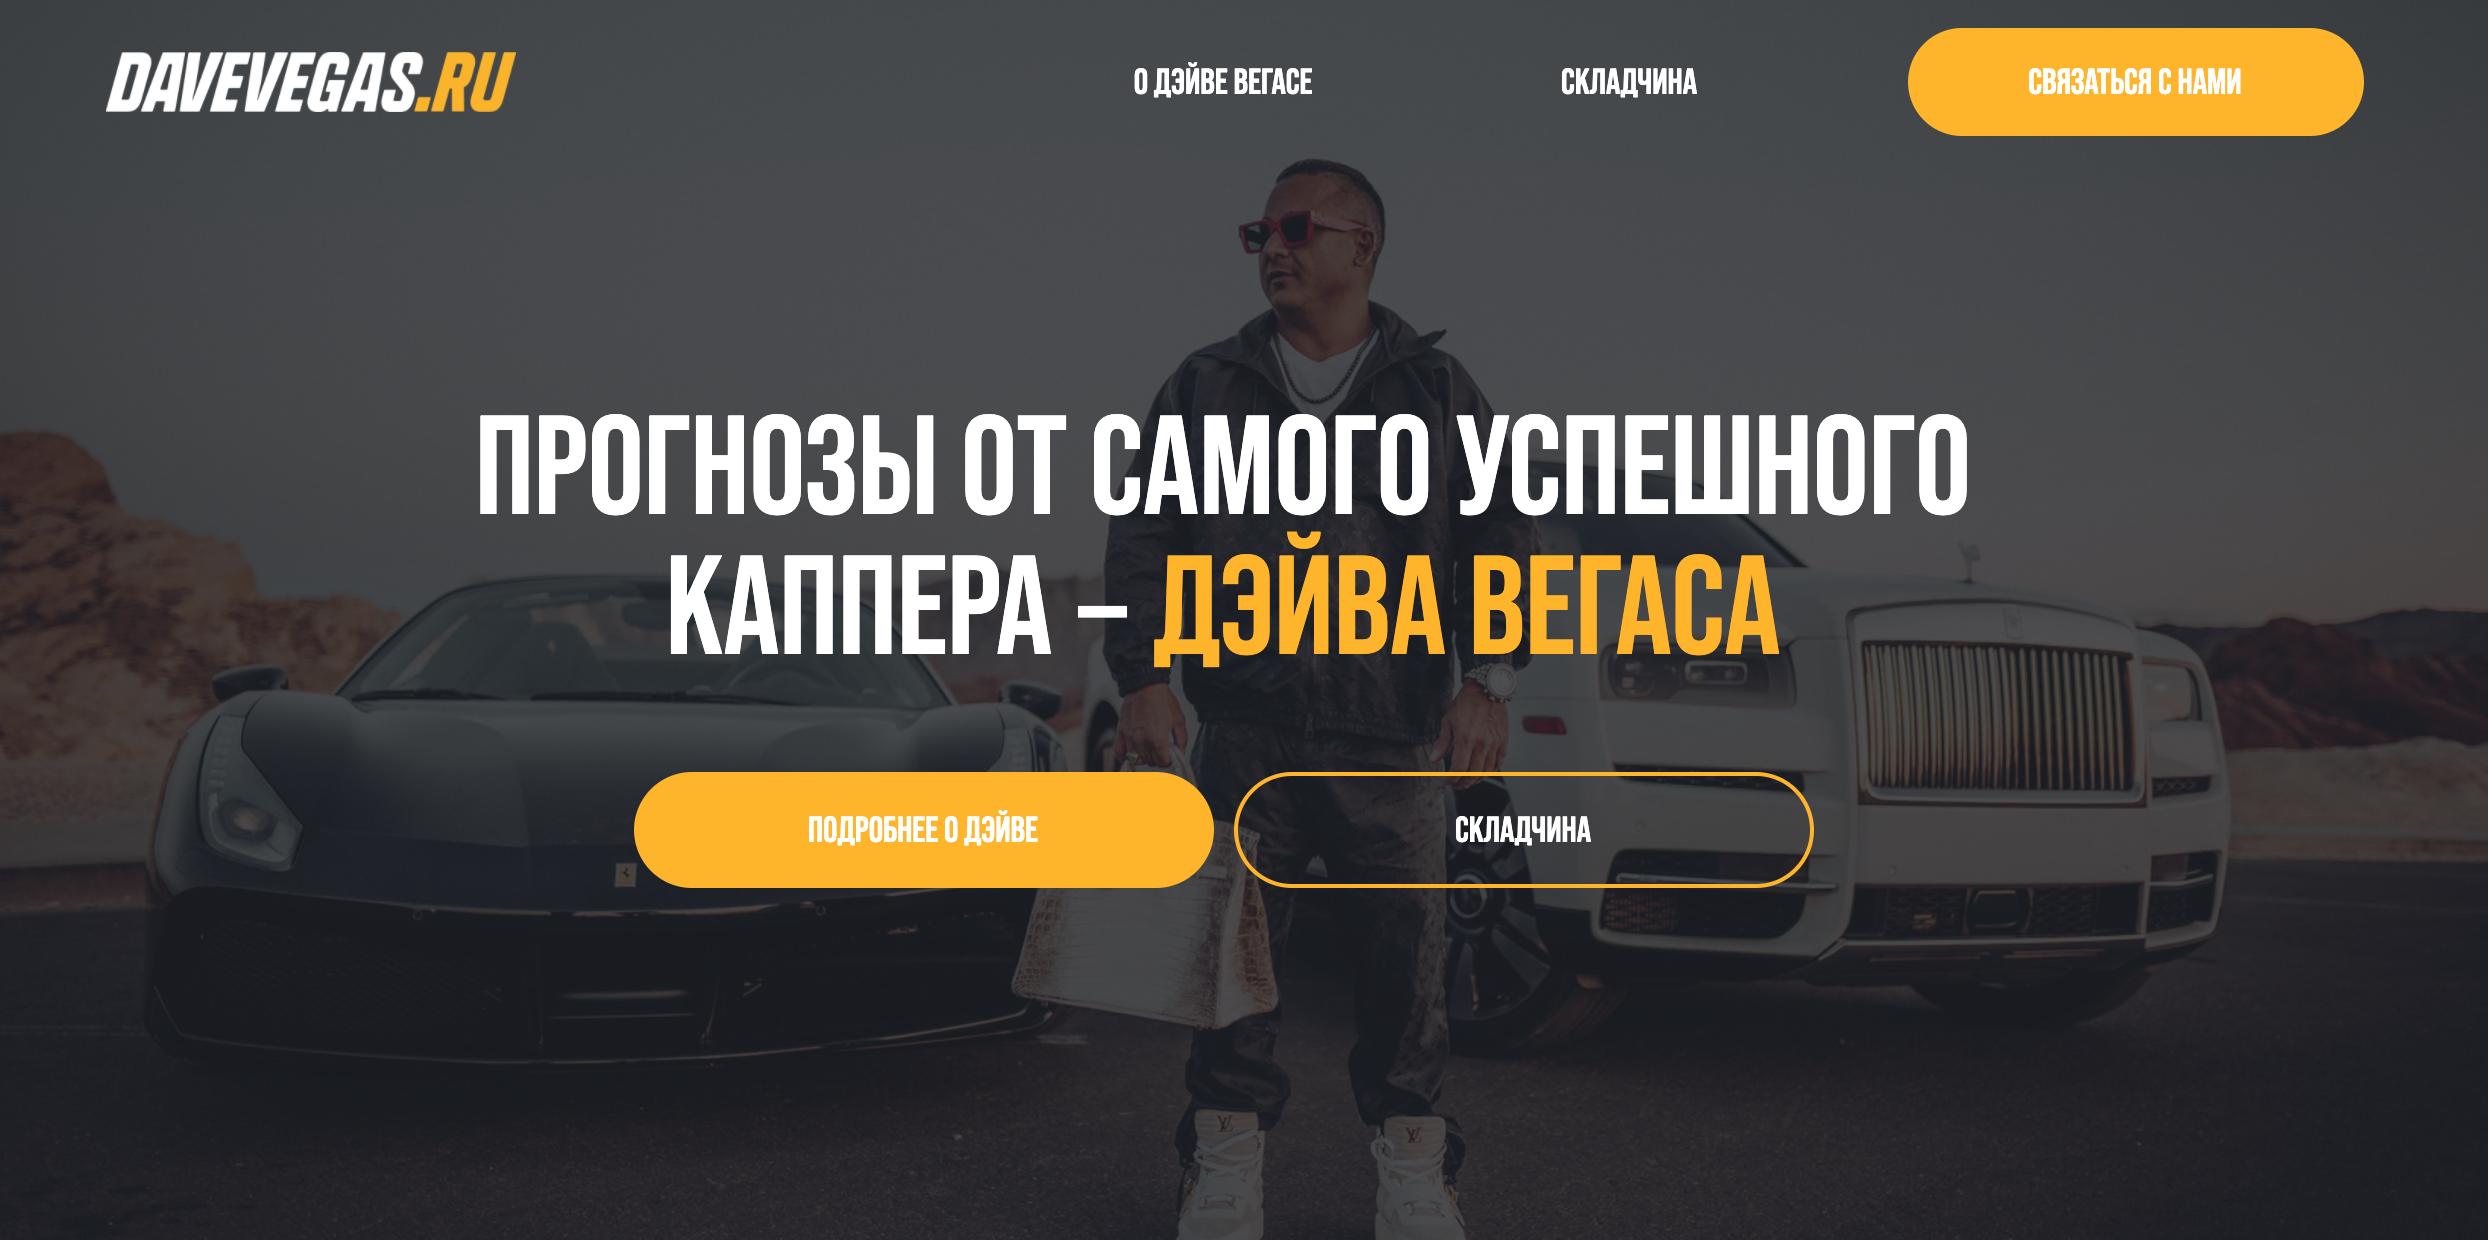 Главная страница сайта davevegas.ru